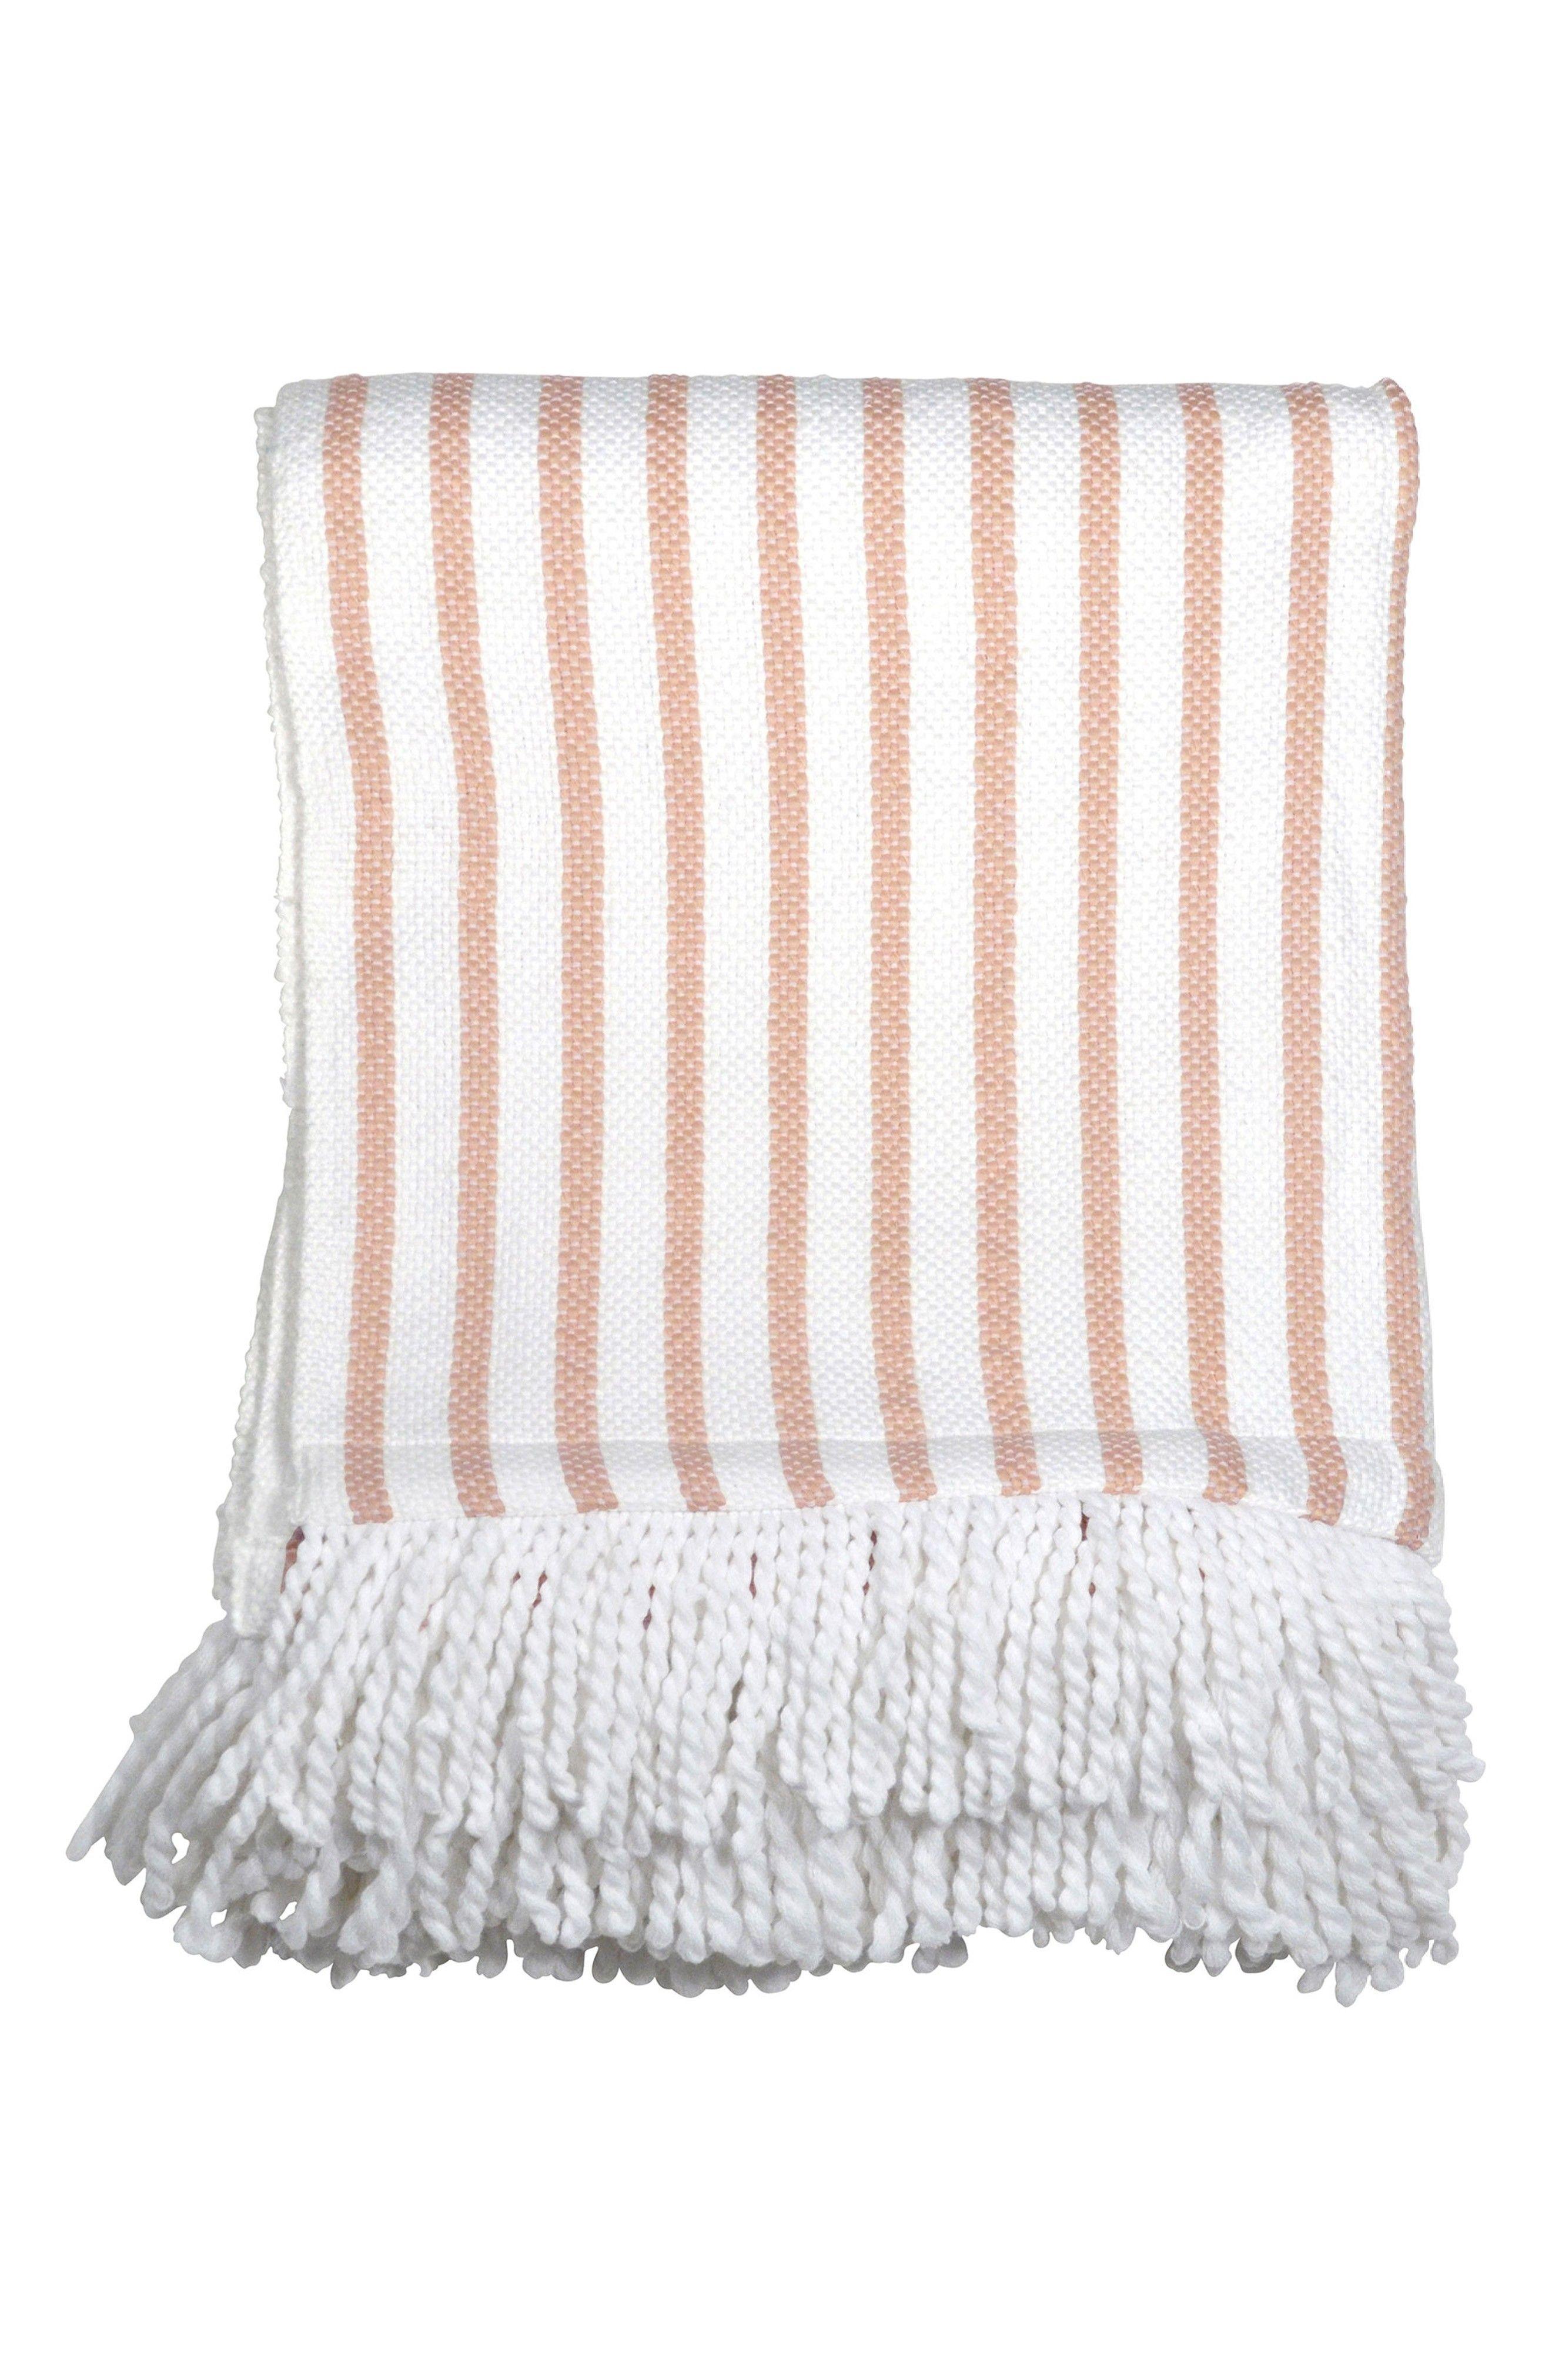 Blush Pink Throw Blanket Main Image  Peri Home Fringe Throw Blanket  Poppy  Pinterest